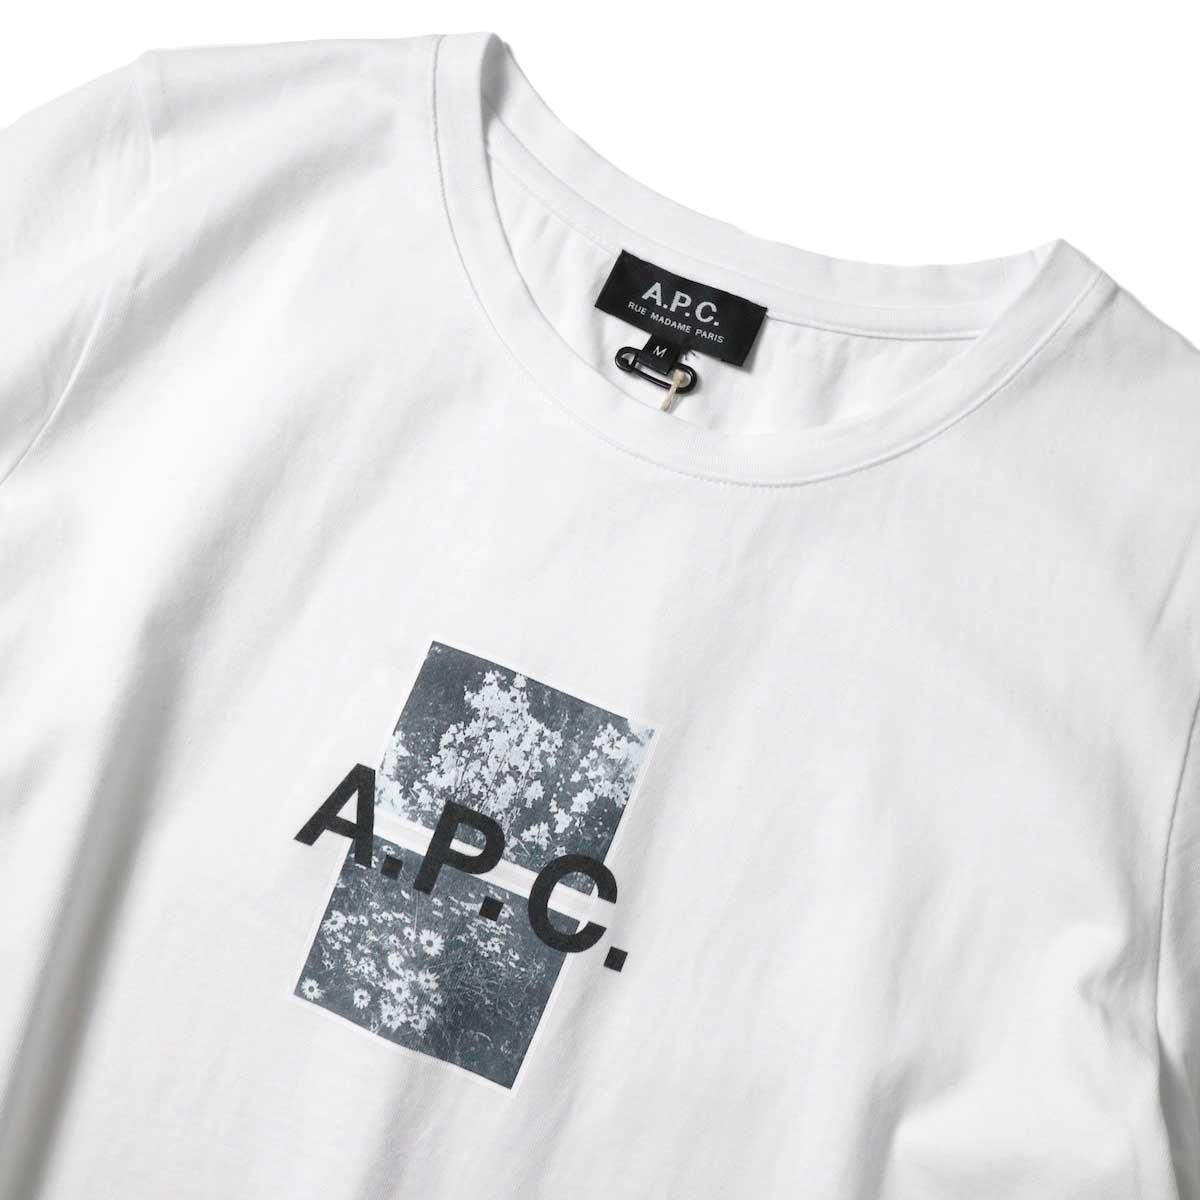 A.P.C. / ERYN Tシャツ (White) プリント